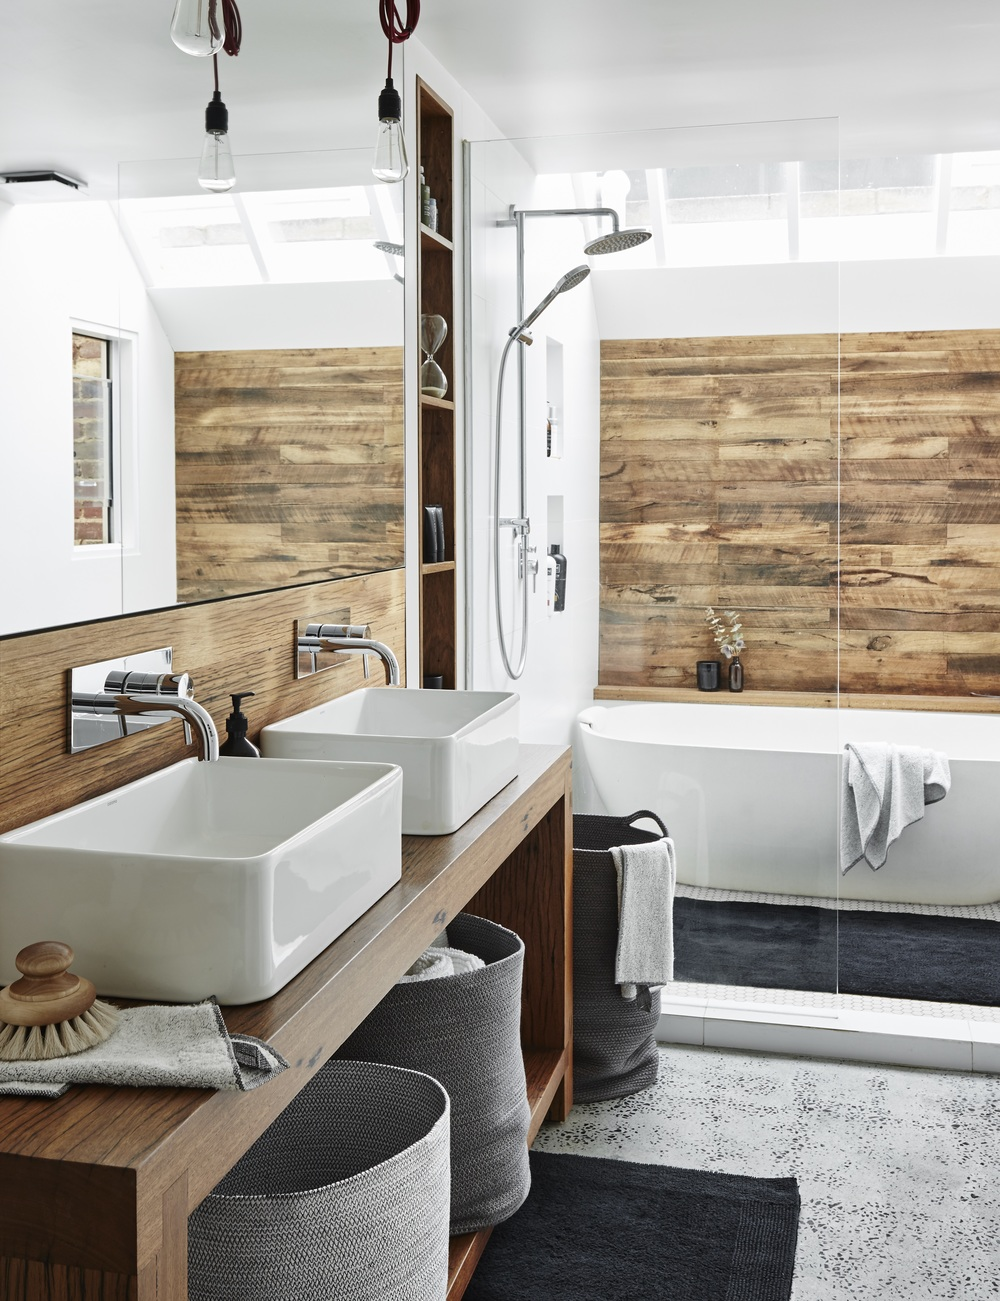 Kali Cavanagh - Abode Living - Bathroom image.jpg